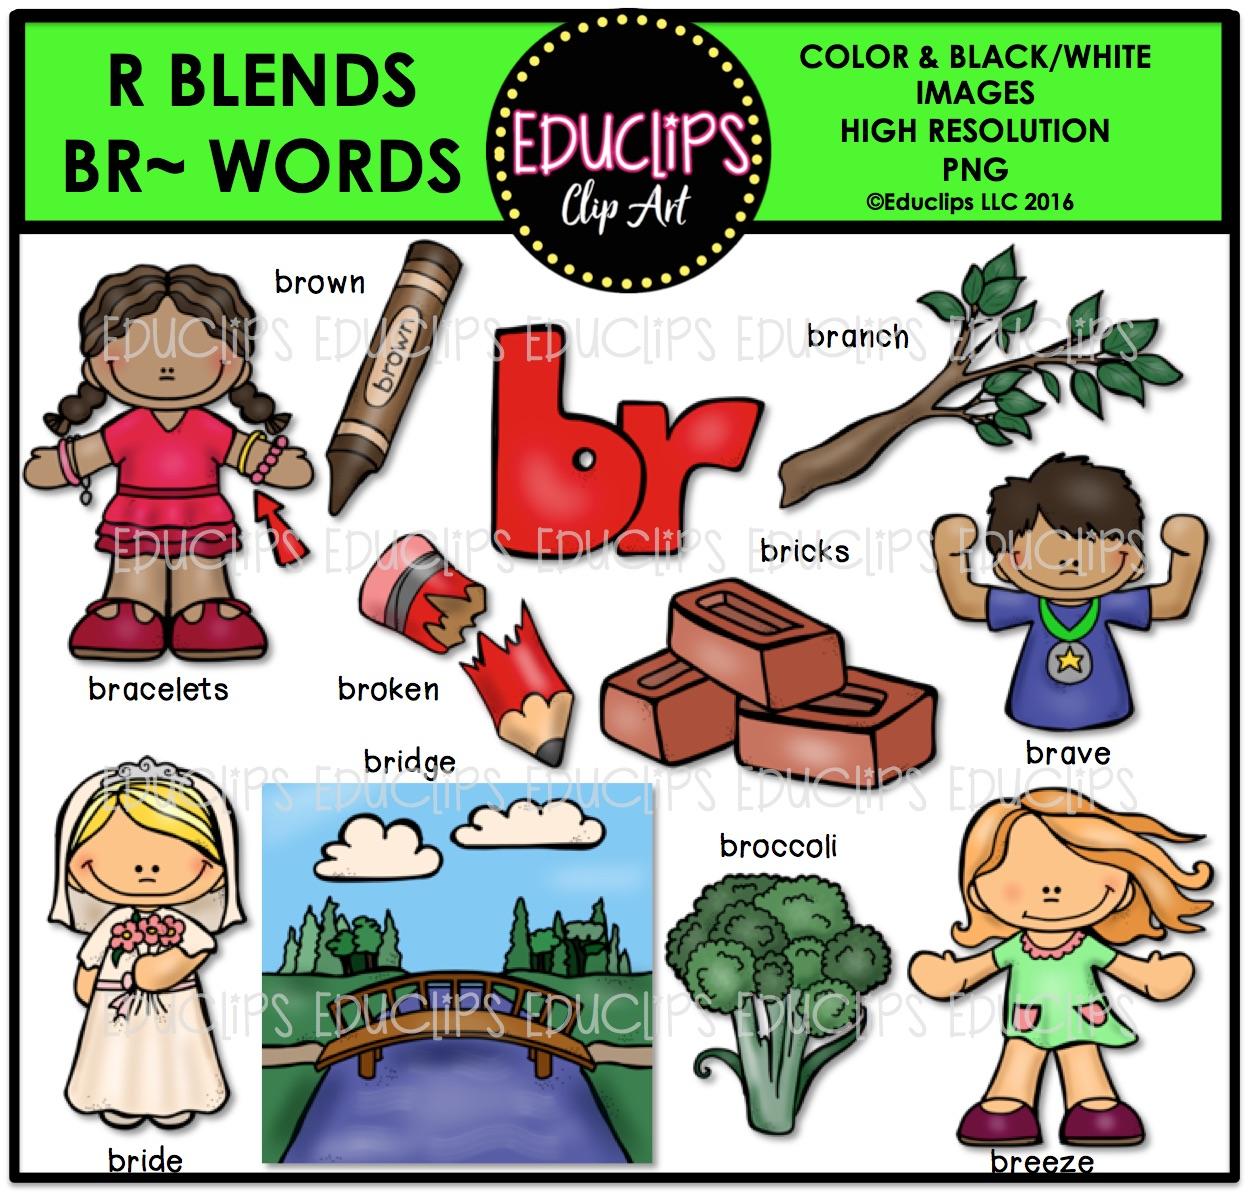 R Blends BR Words Clip Art Bundle (Color and B&W).